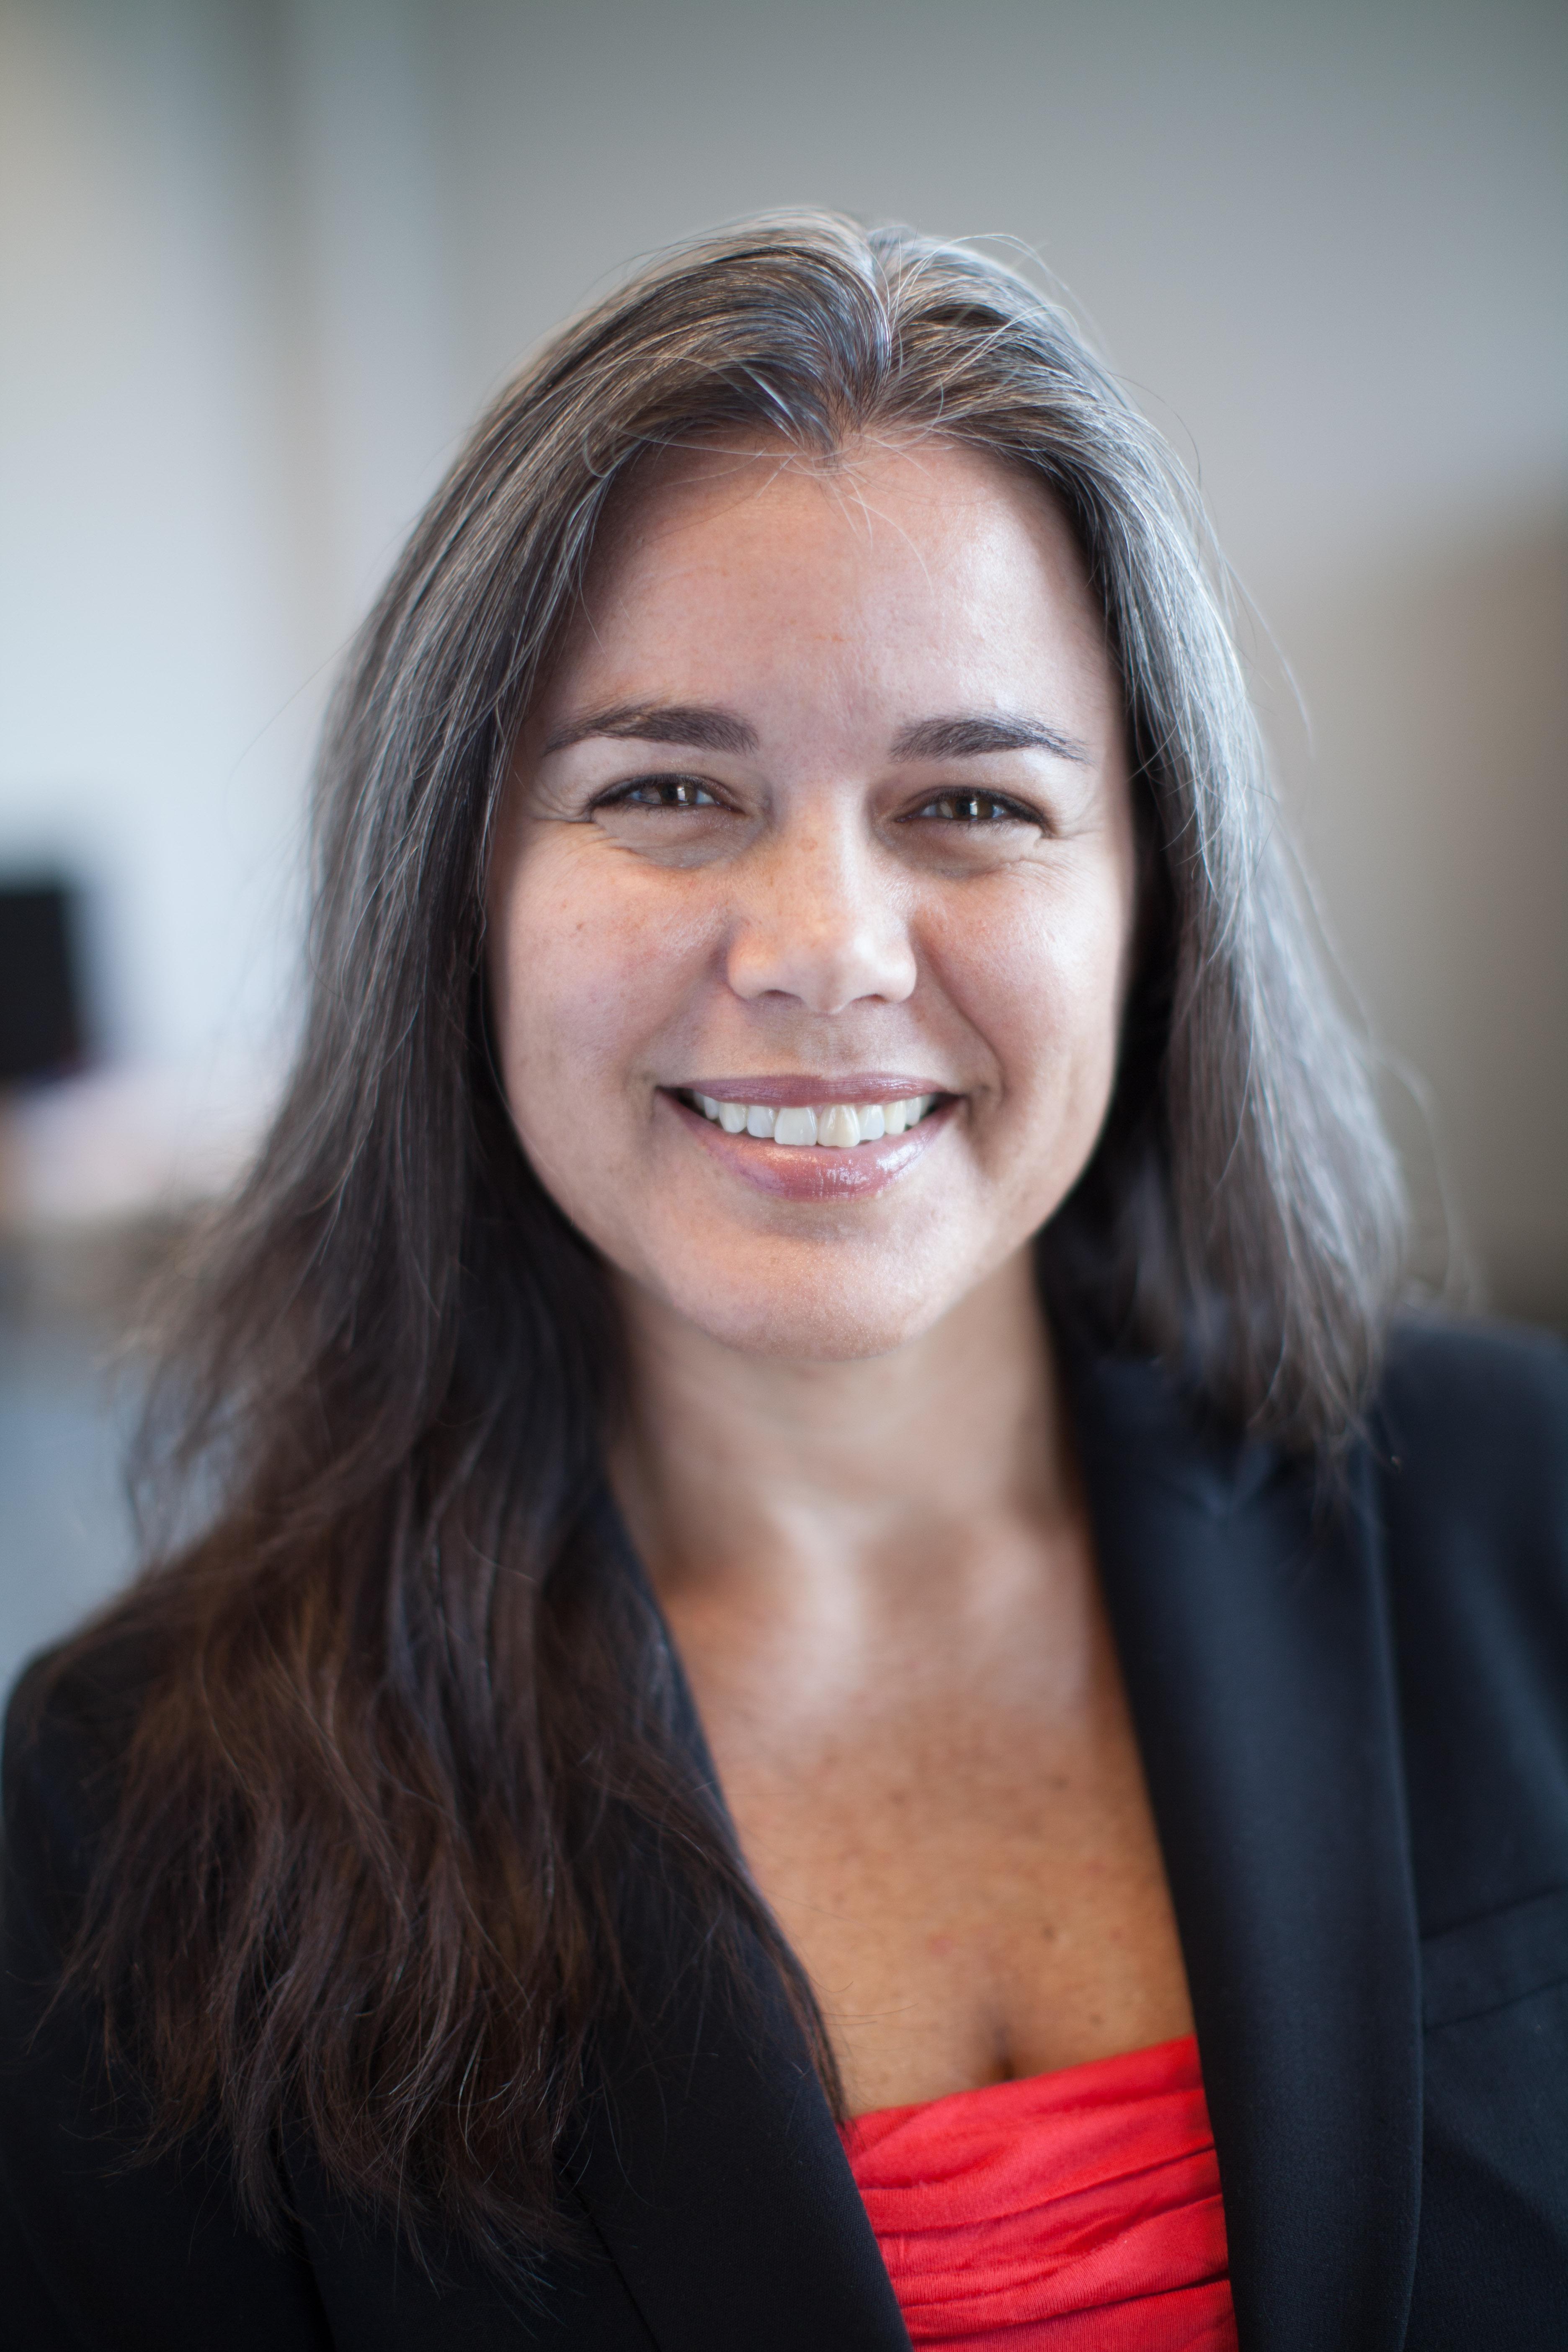 Headshot of GHUCCTS KL2 Scholar Roxanne Mirabel-Beltran